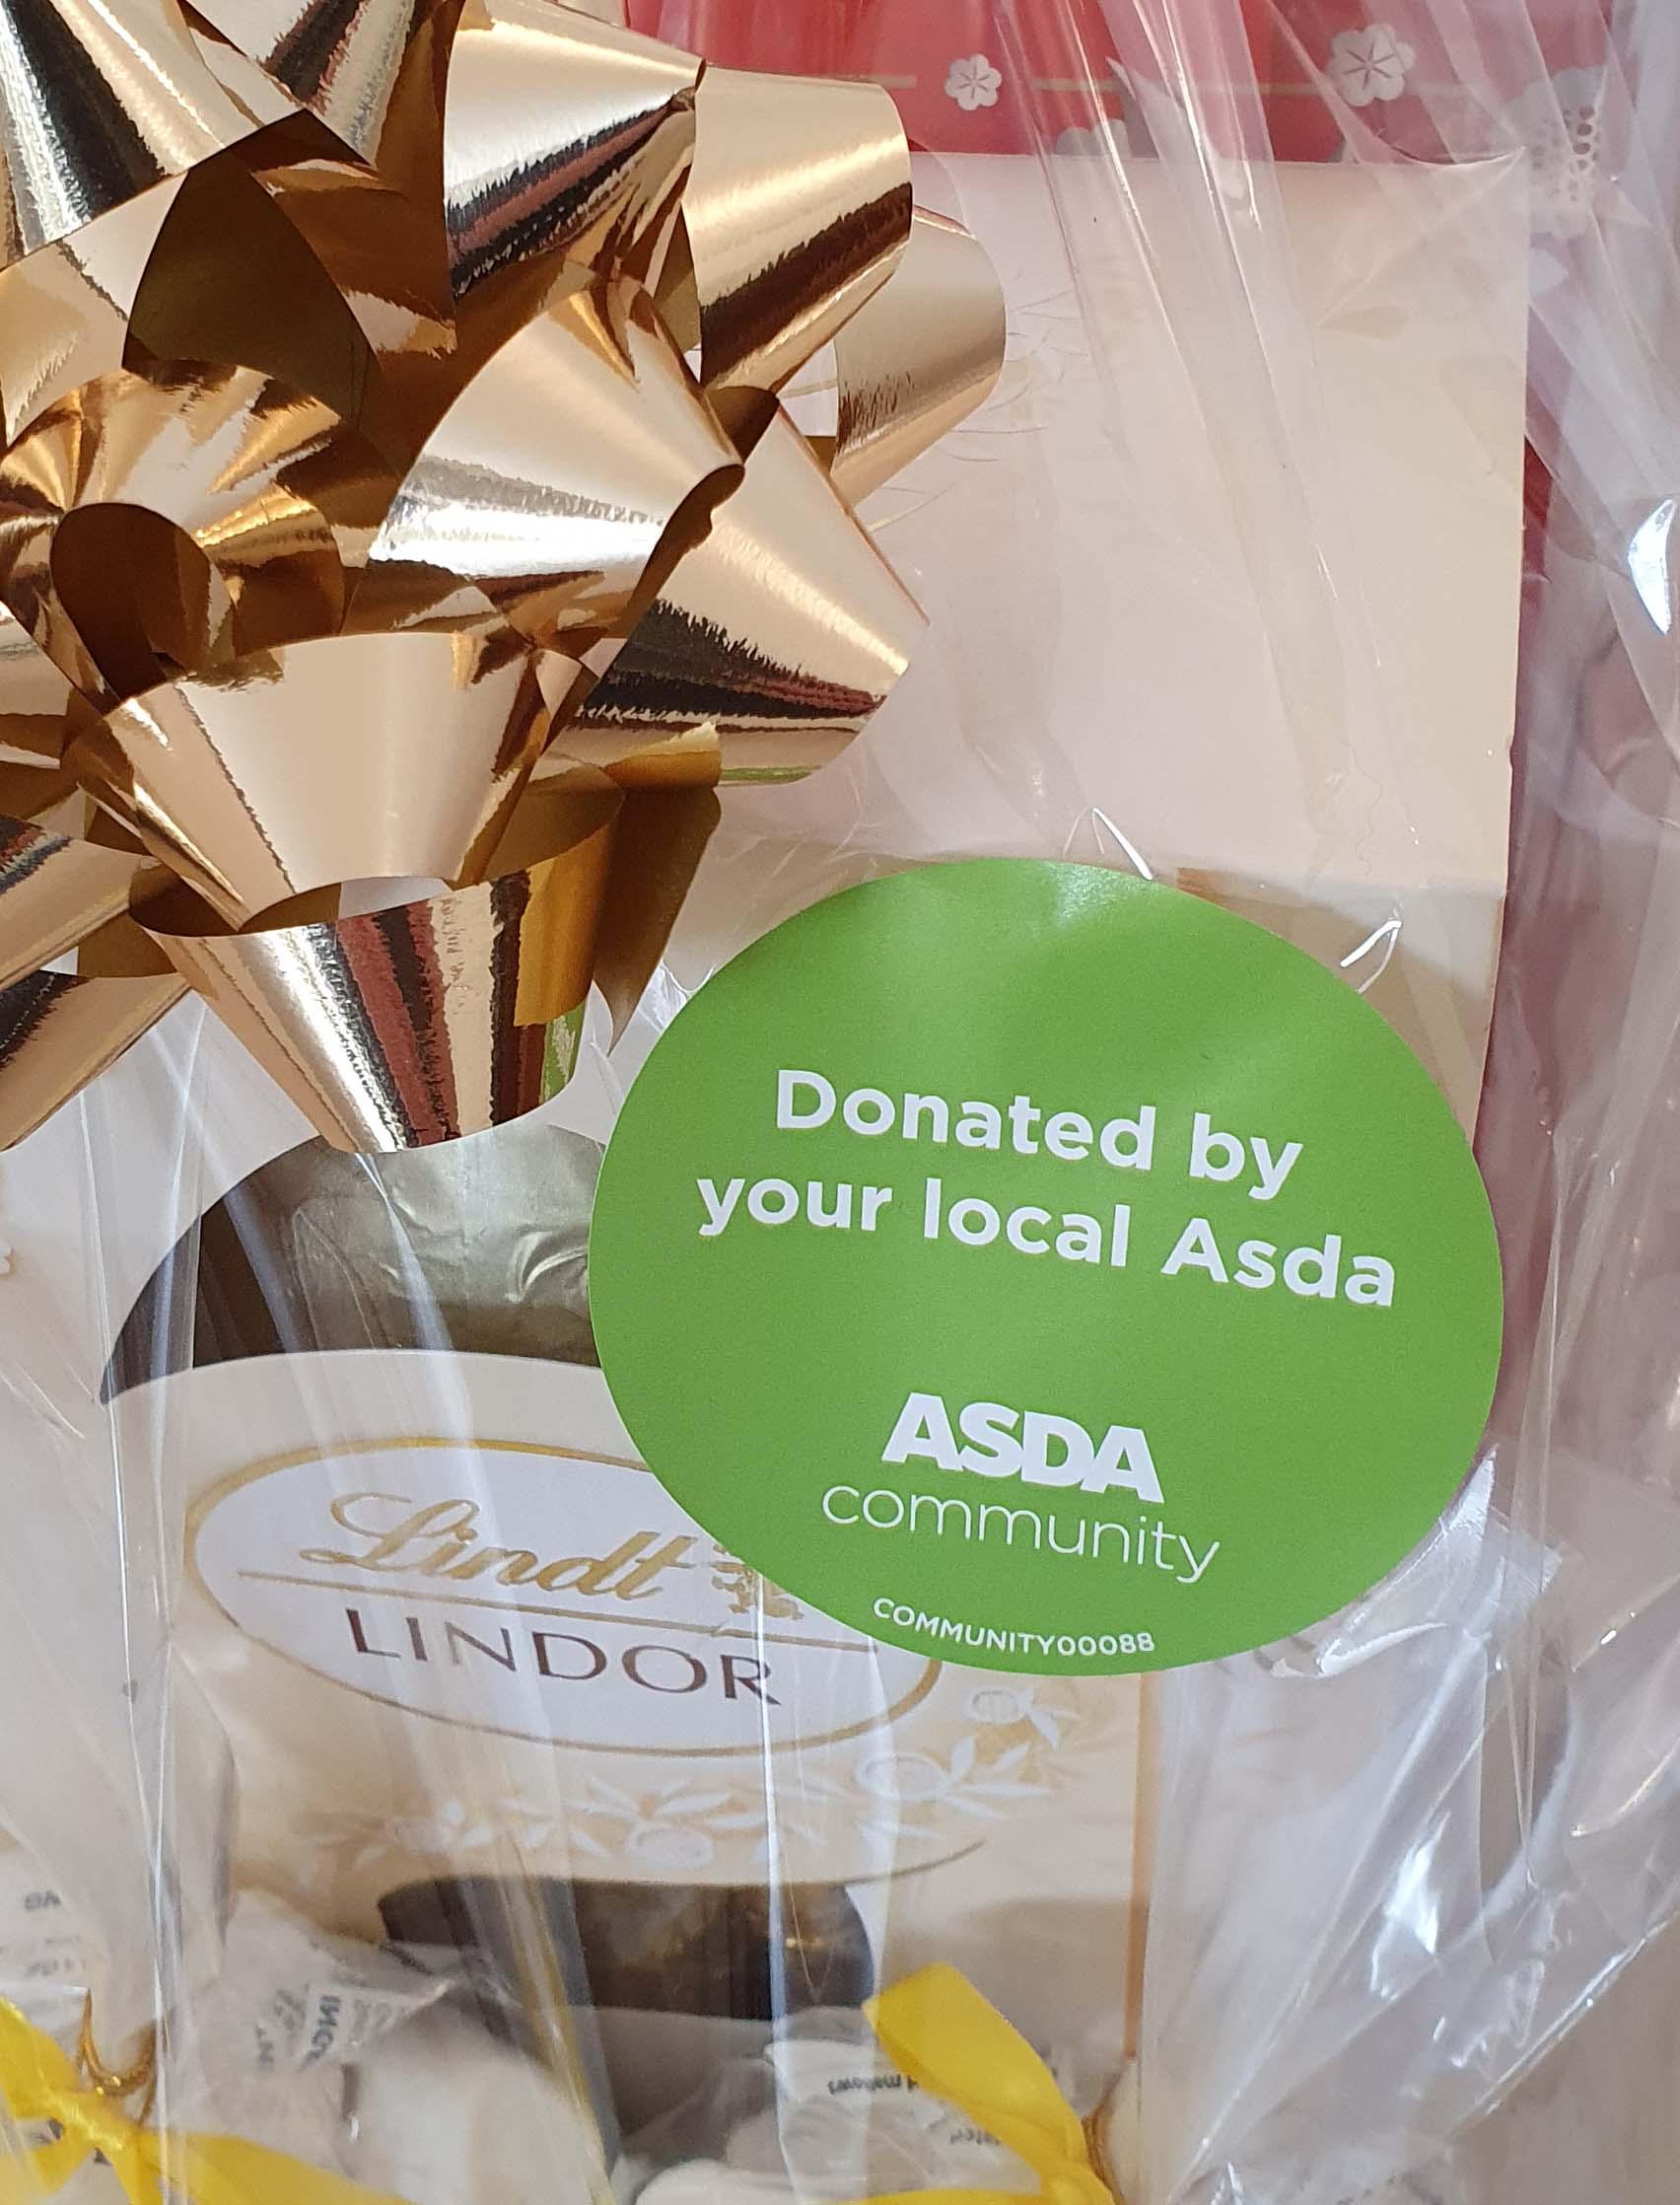 Donated by Asda St Leonards On Sea